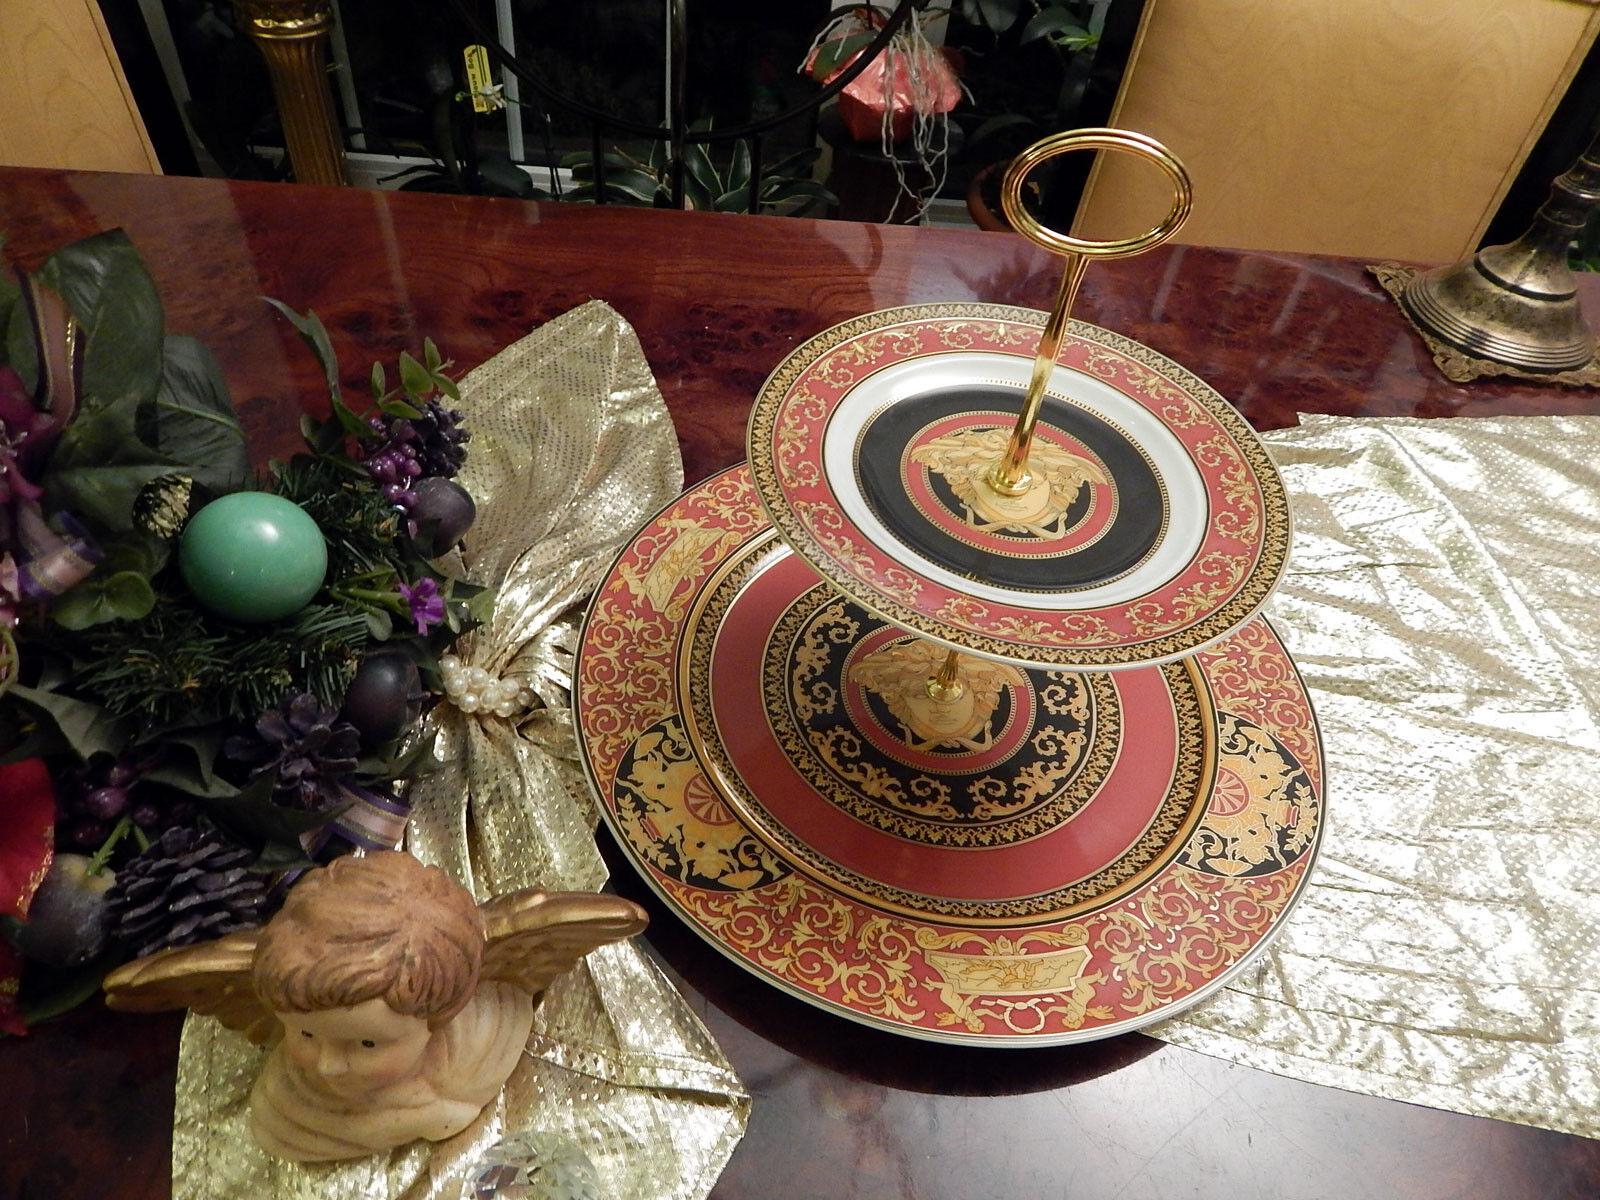 Edle riesige Etagere 31 cm Durchmesser 2stufig Rosanthal Versace Medusa rot   | Erste in seiner Klasse